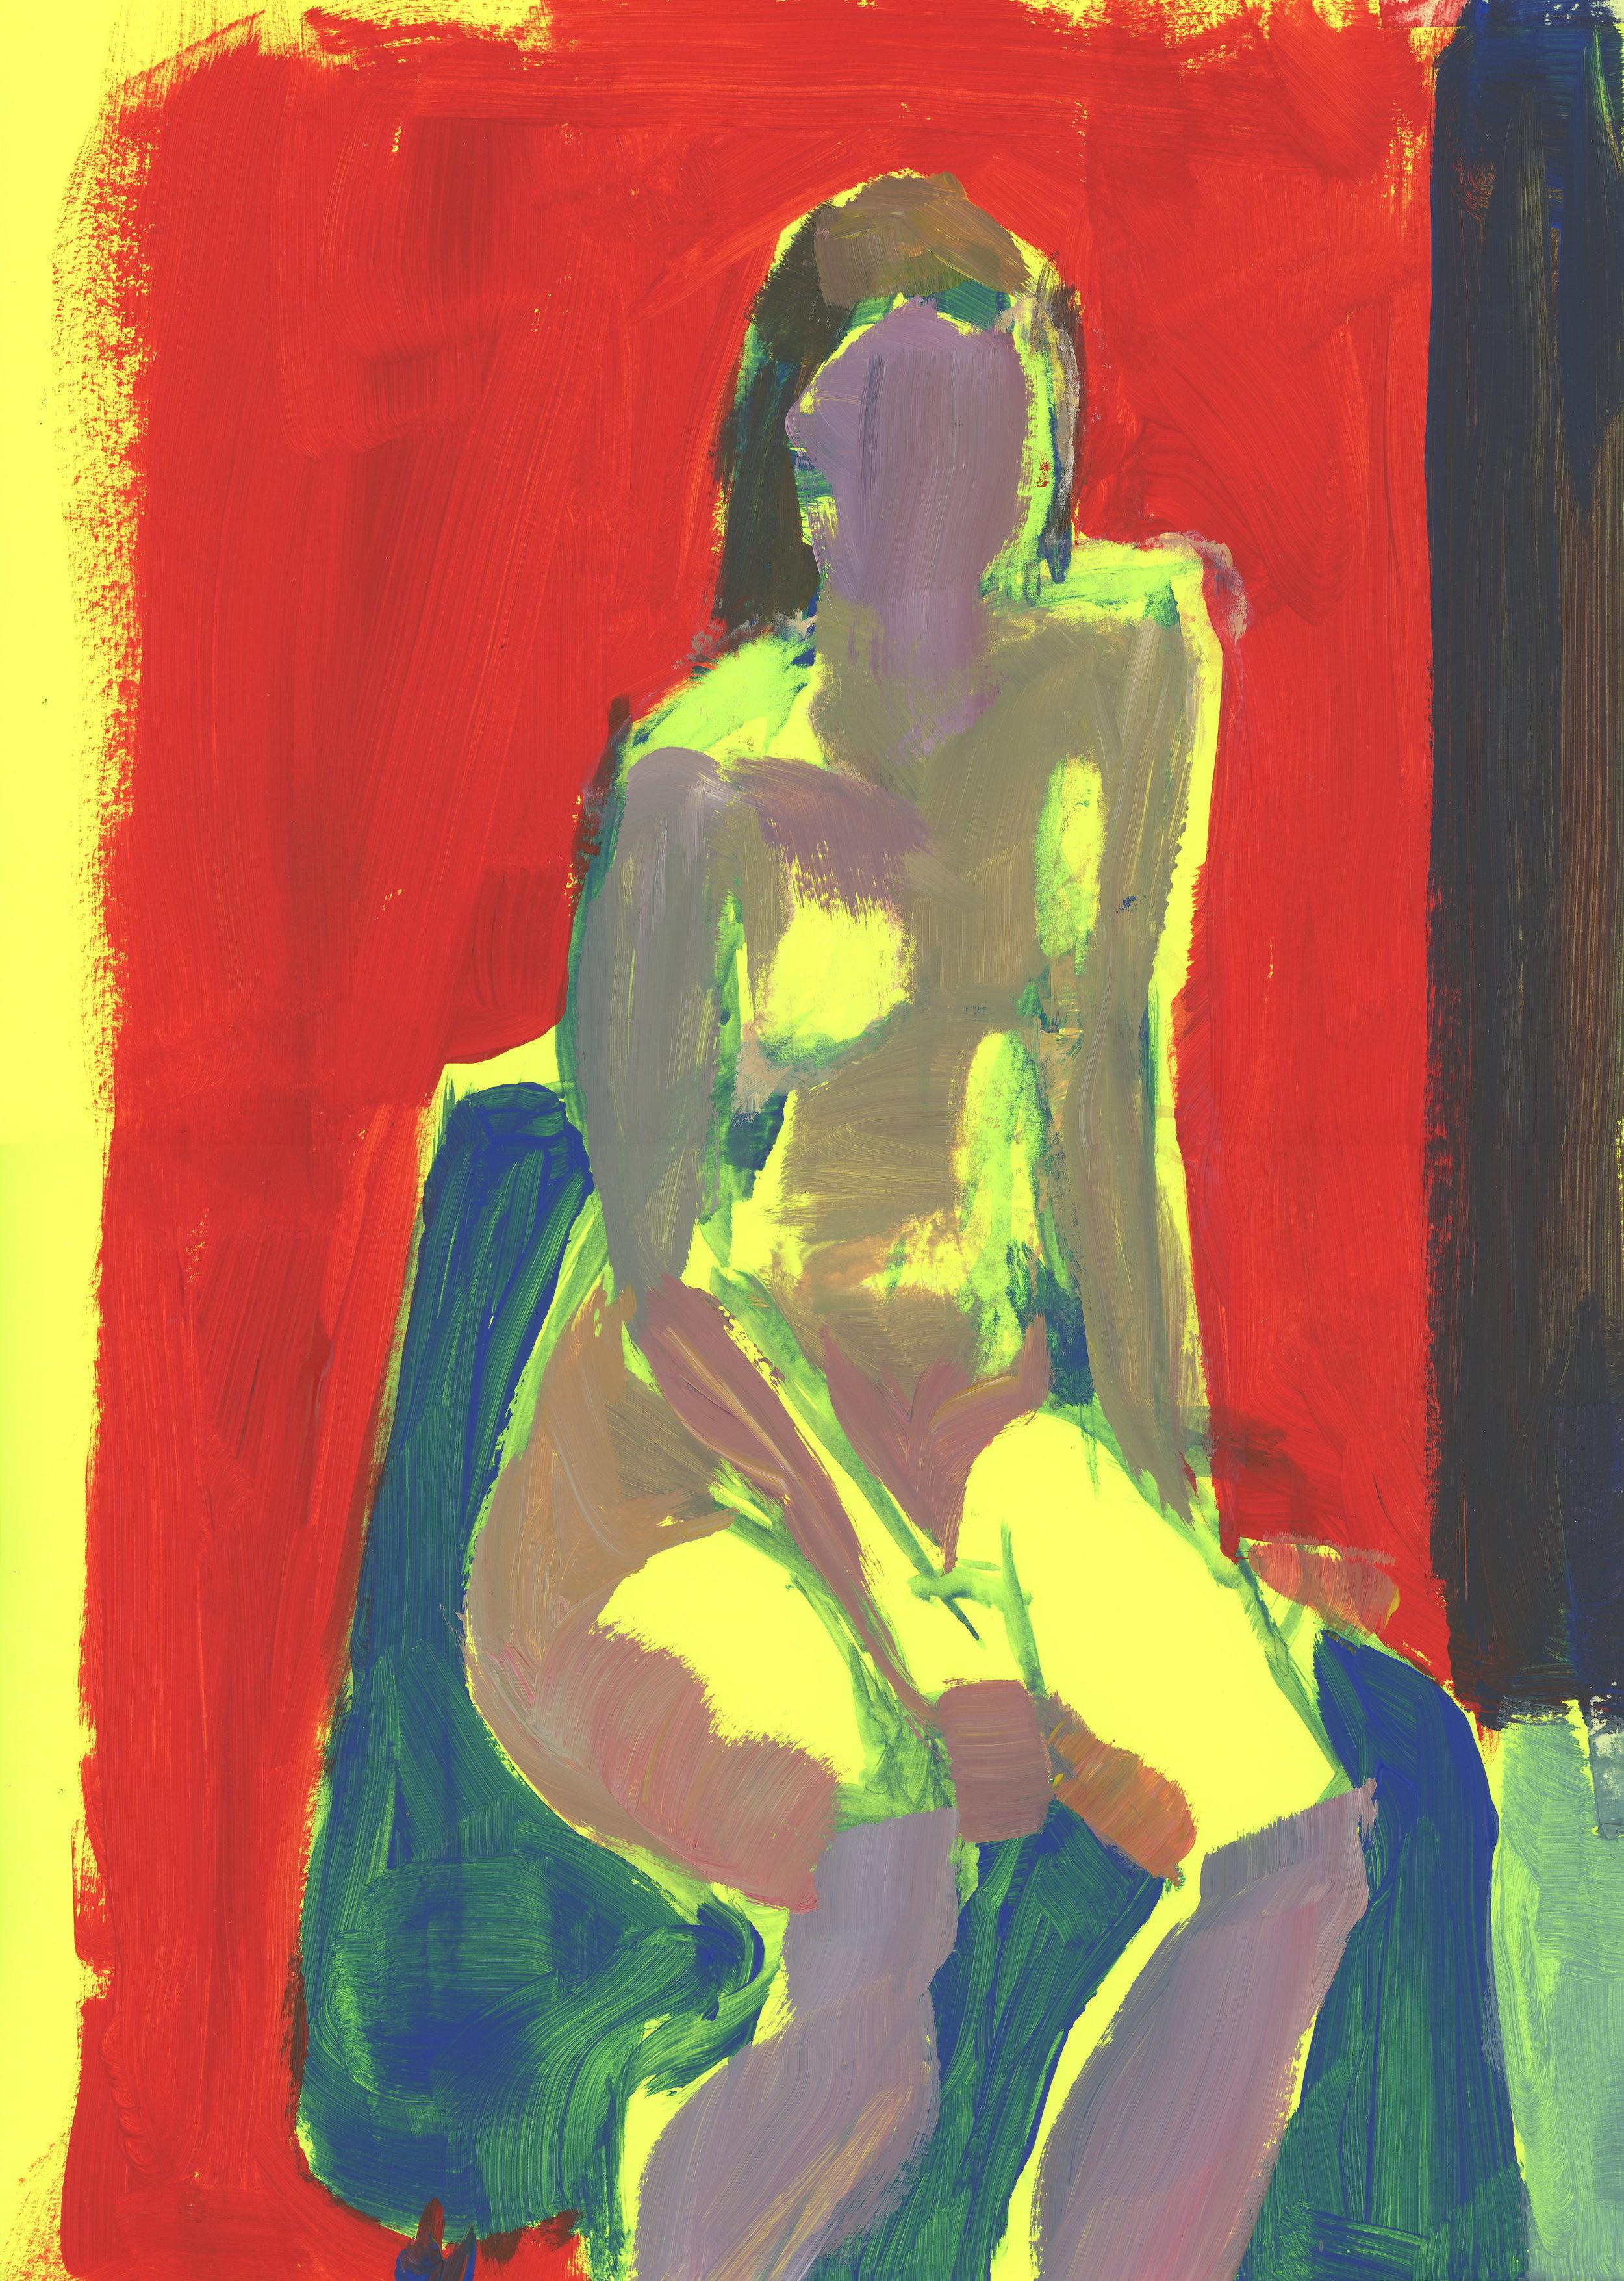 Fluorescent Jacqueline – acrylic on card, 2018